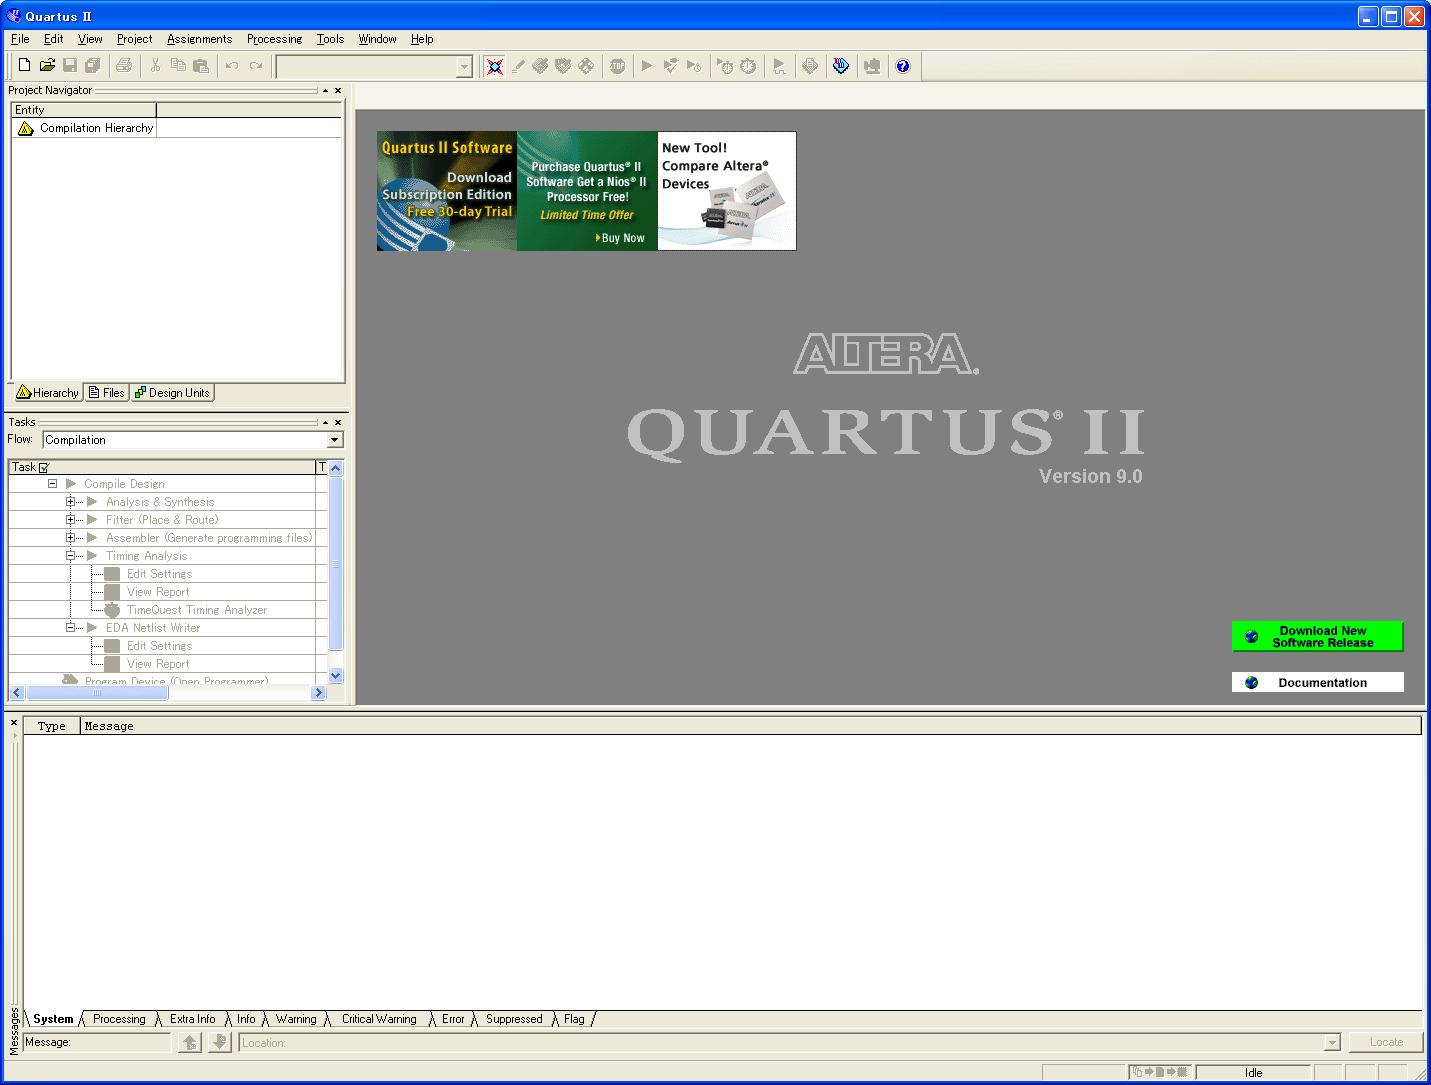 Quartus II Subscription Edition 13 1 Download (Free trial